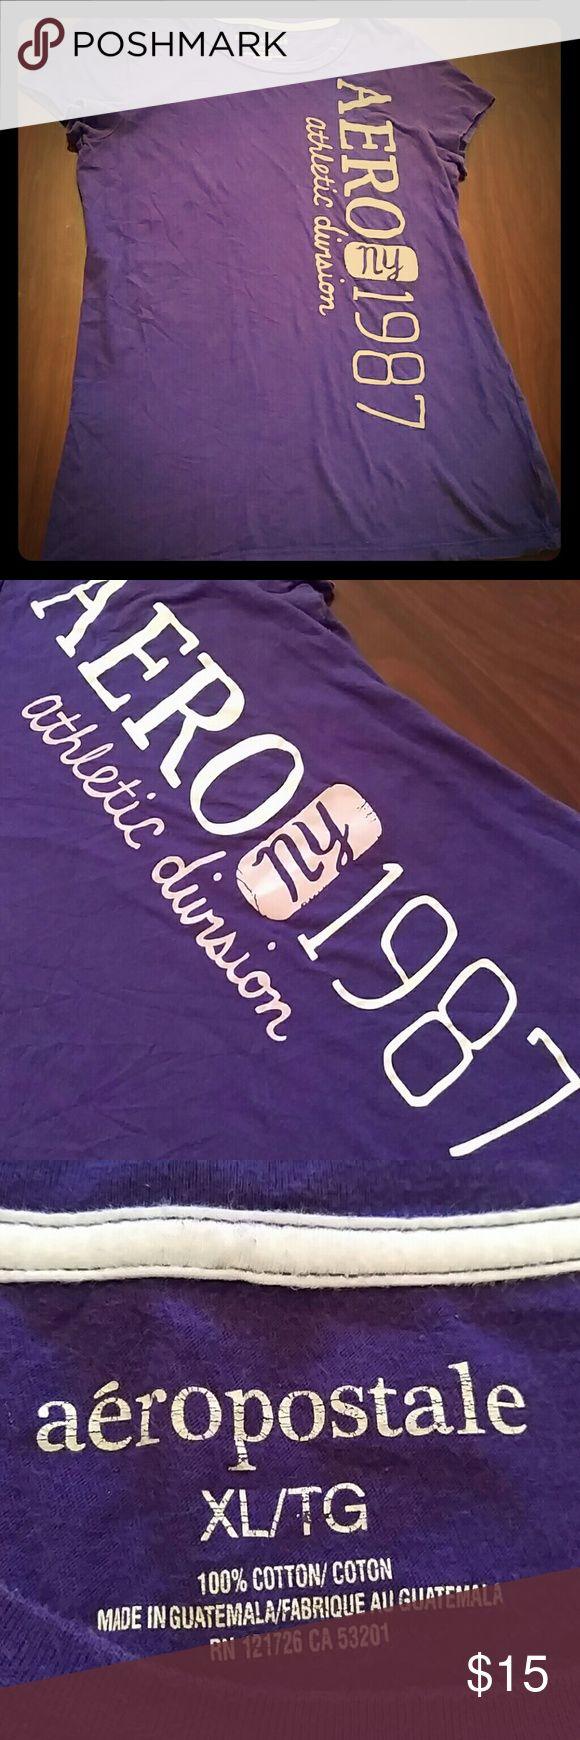 Aeropostale tee shirt Cute purple women's Aeropostale T-shirt size XL. In good condition Aeropostale Tops Tees - Short Sleeve